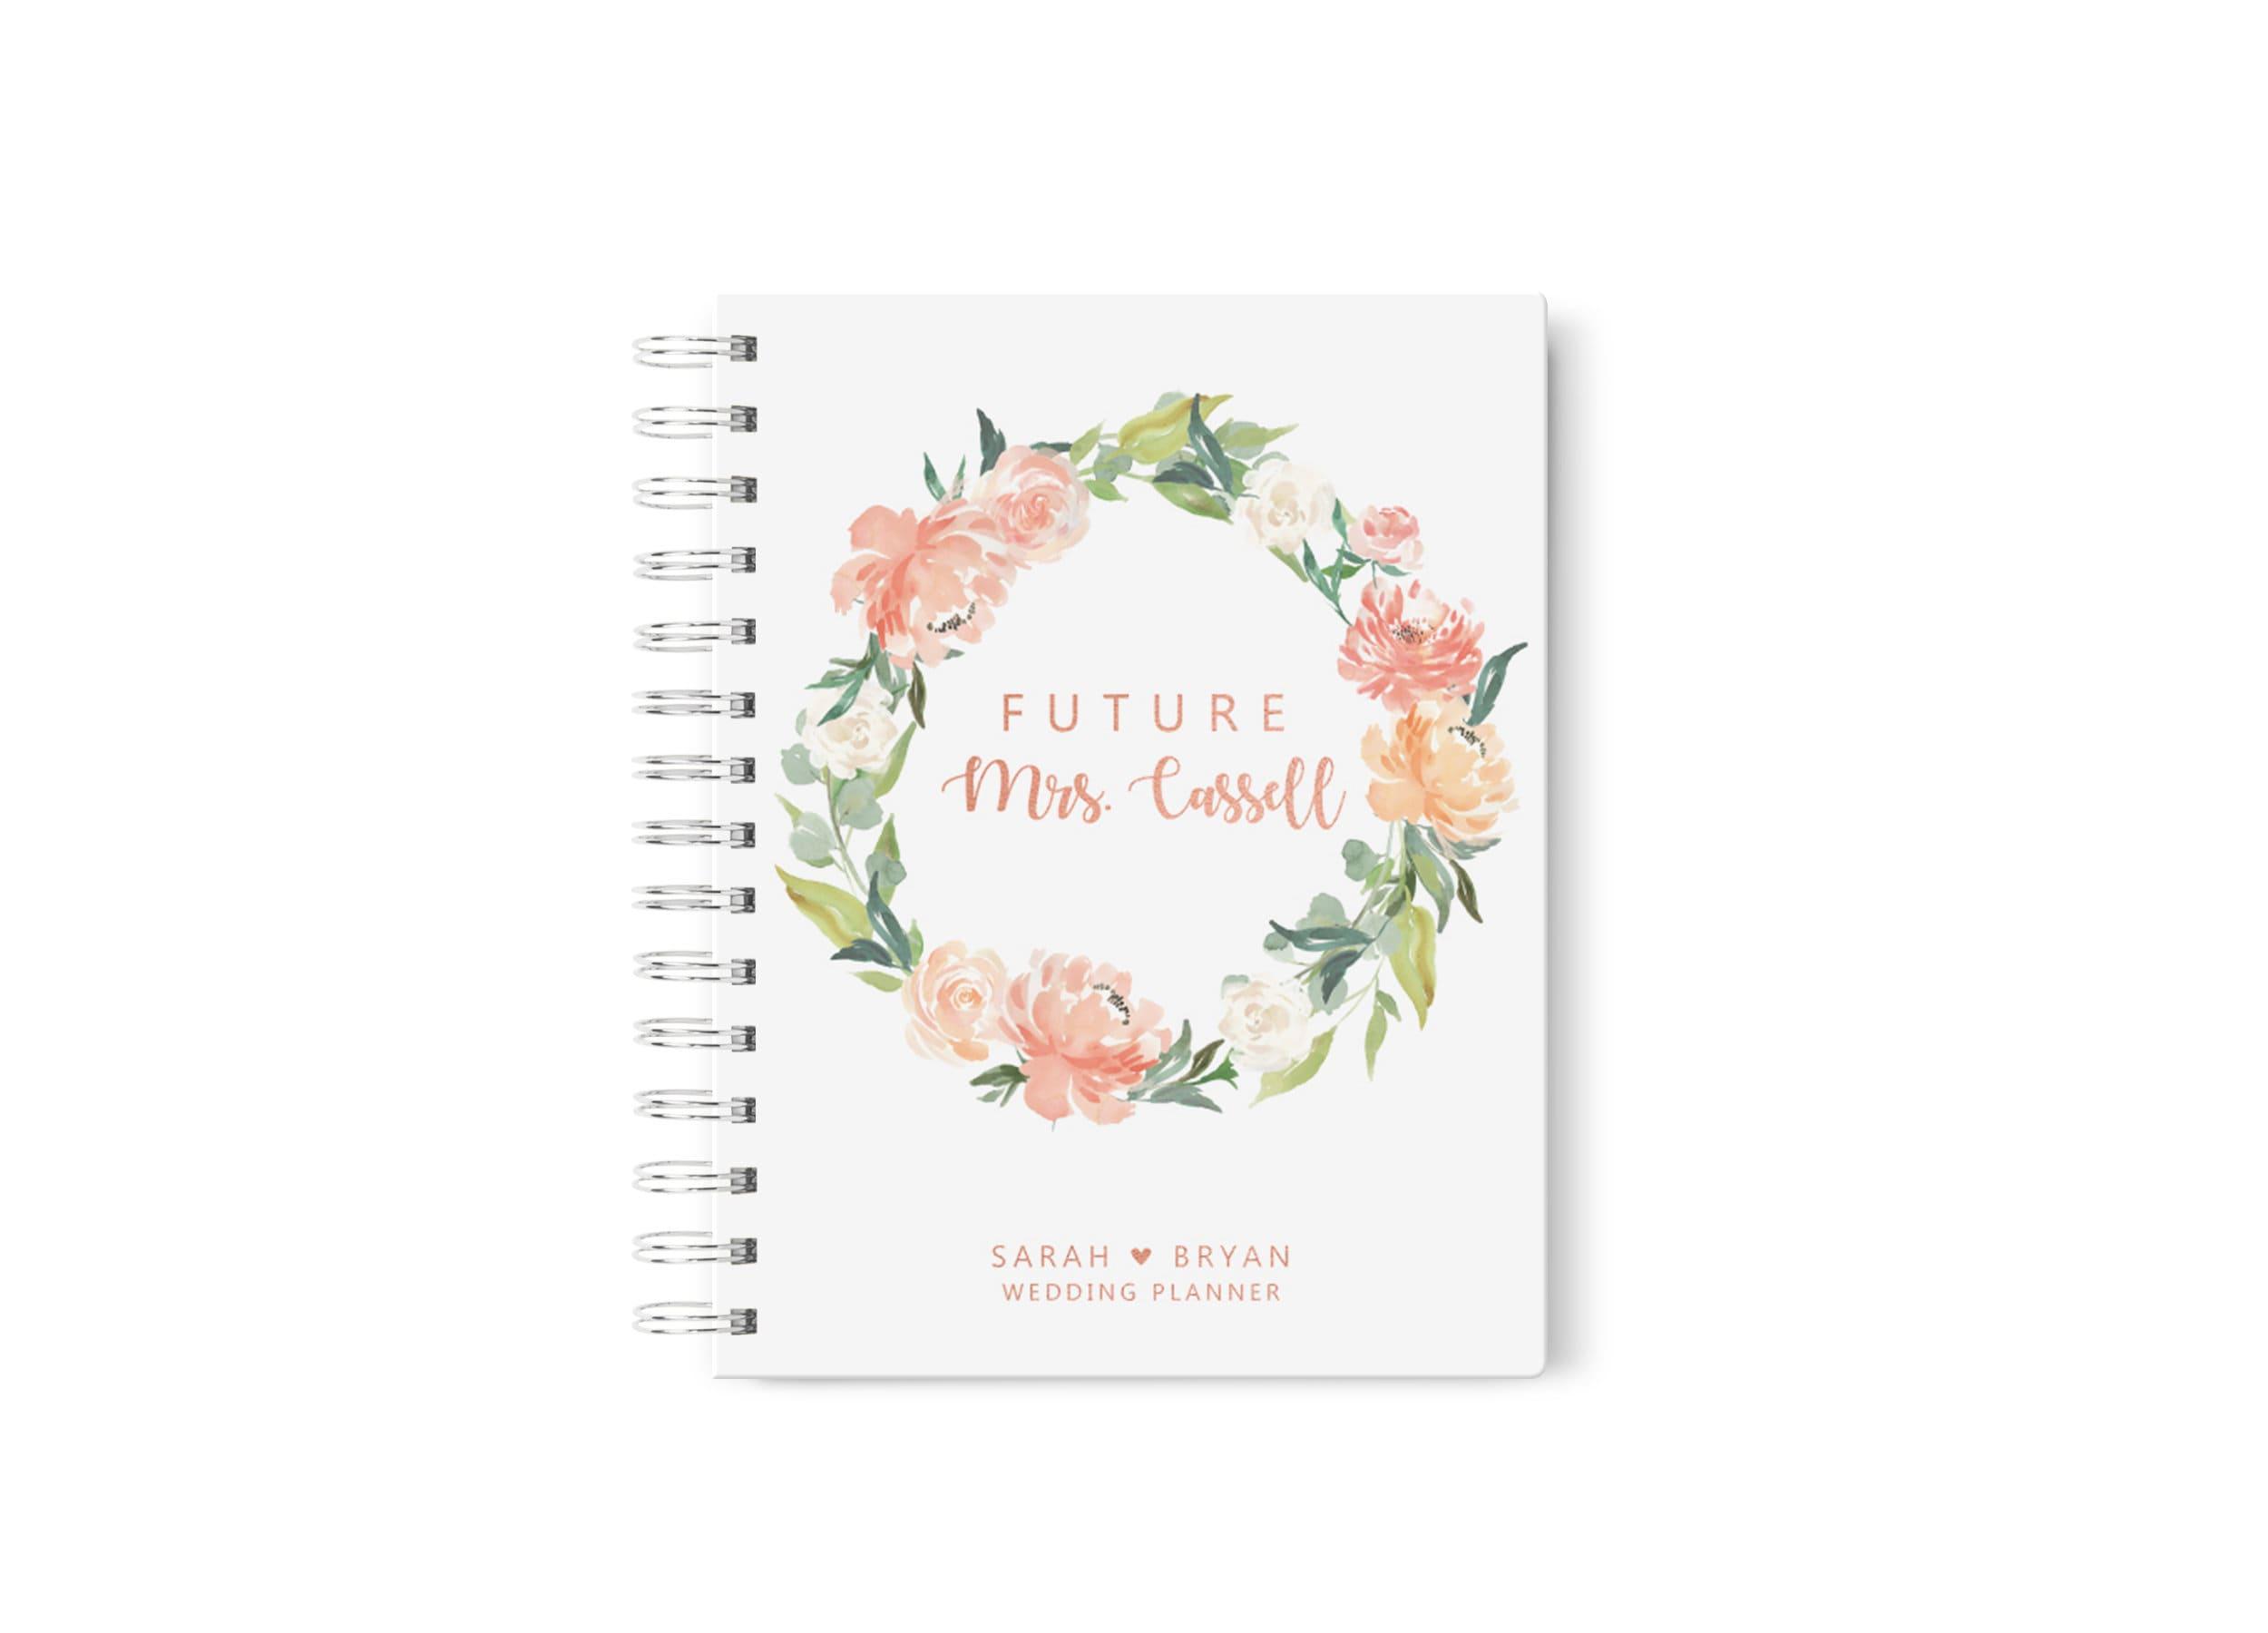 Peach Wedding Planner Personalized Wedding Planning Book Etsy